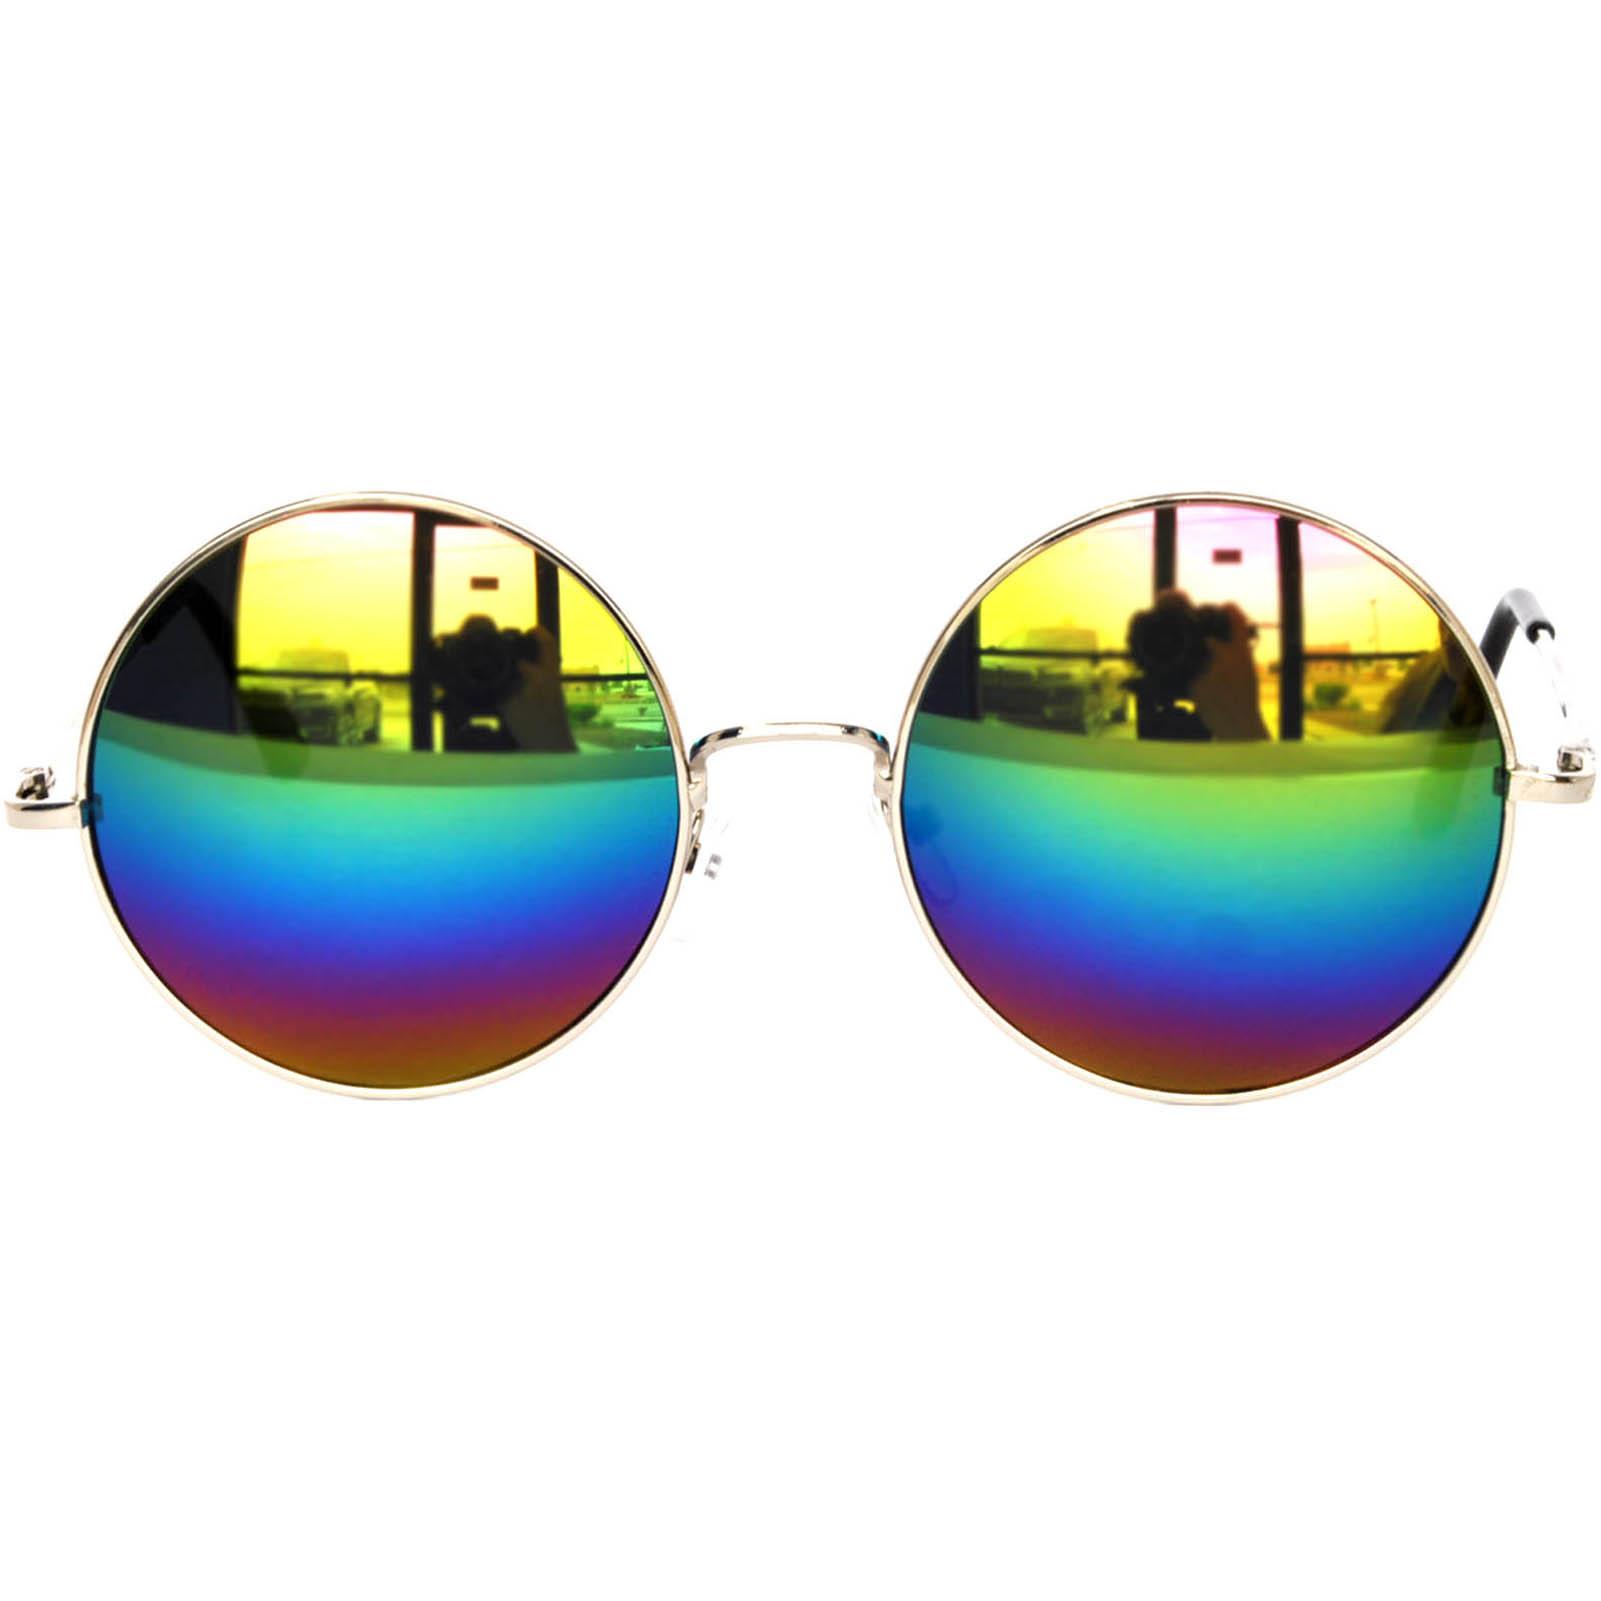 16f052d509 OWL ® Eyewear Wholesale Sunglasses 56mm Women s Metal Round Circle ...